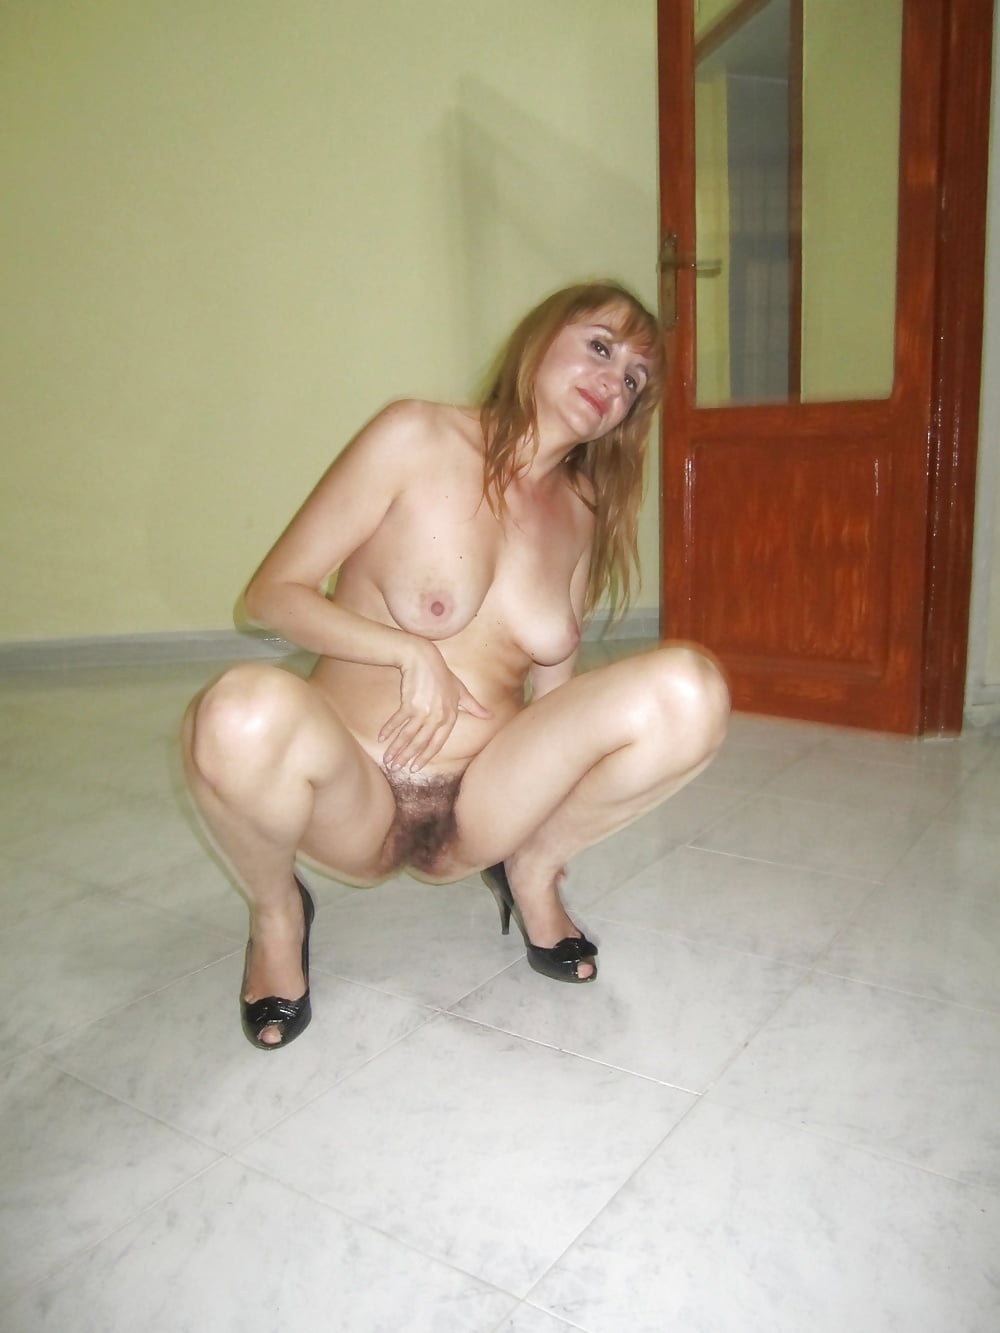 Lucia infermiera toscana ninfomane 2 - 3 2